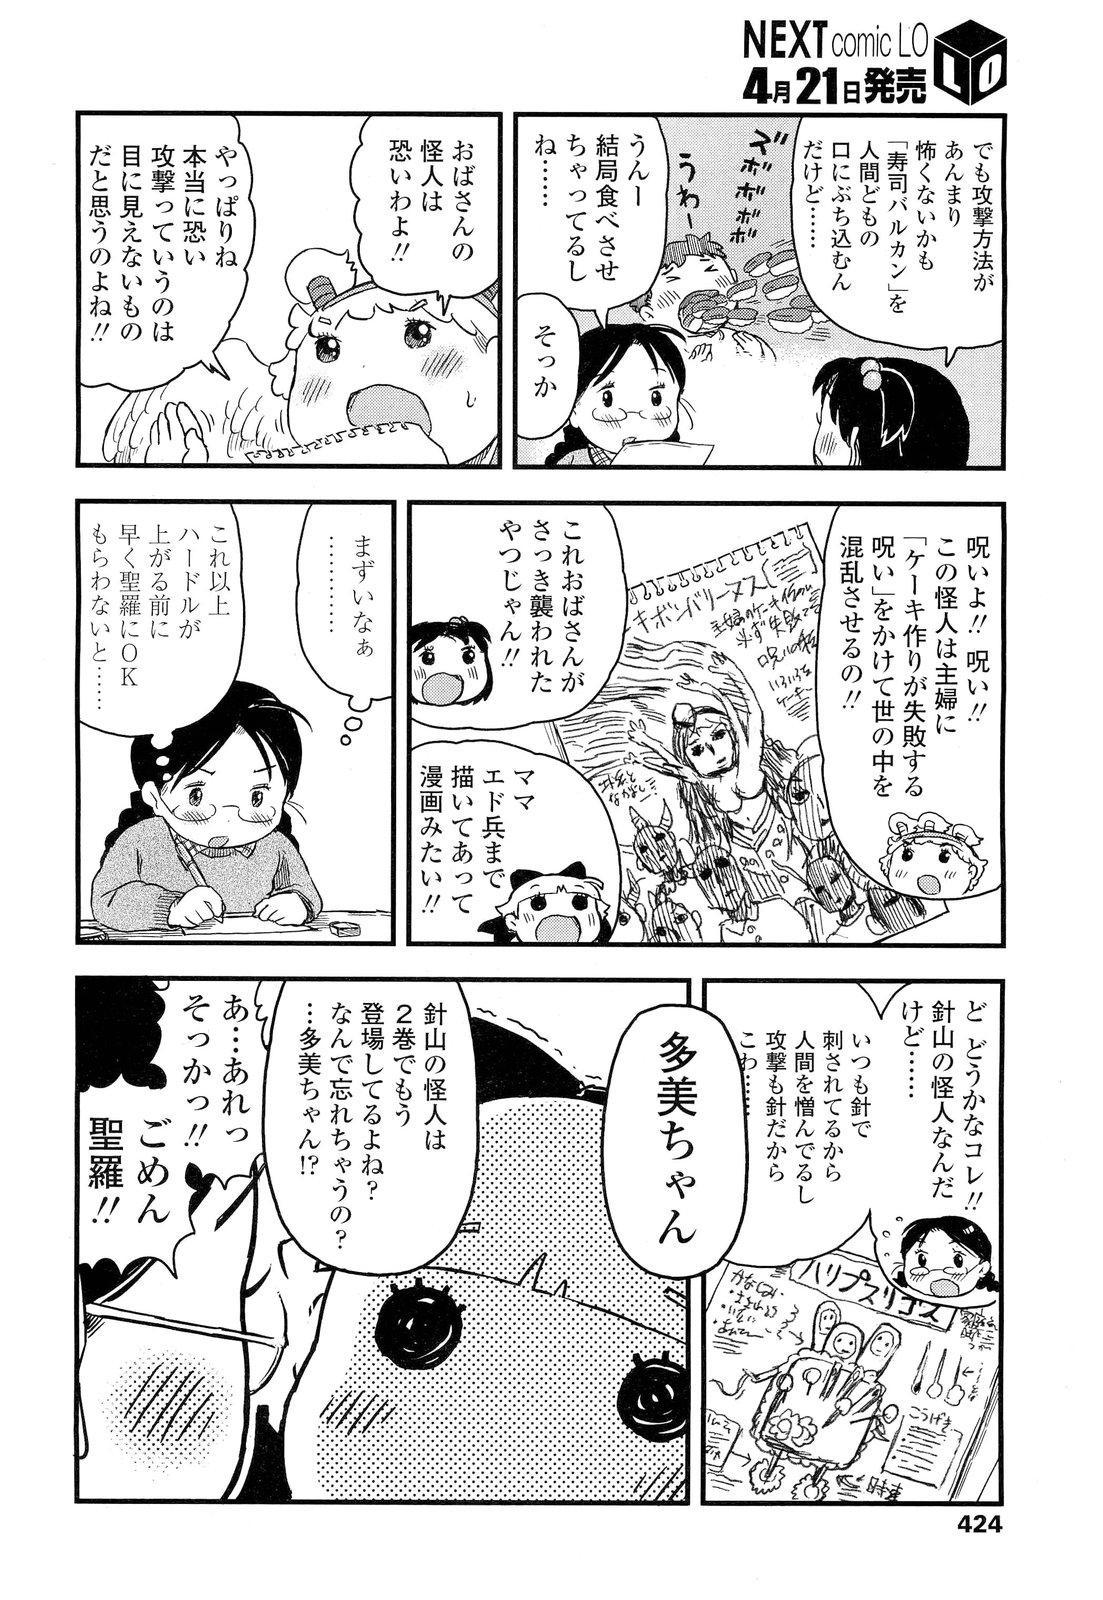 COMIC LO 2012-05 Vol. 98 423